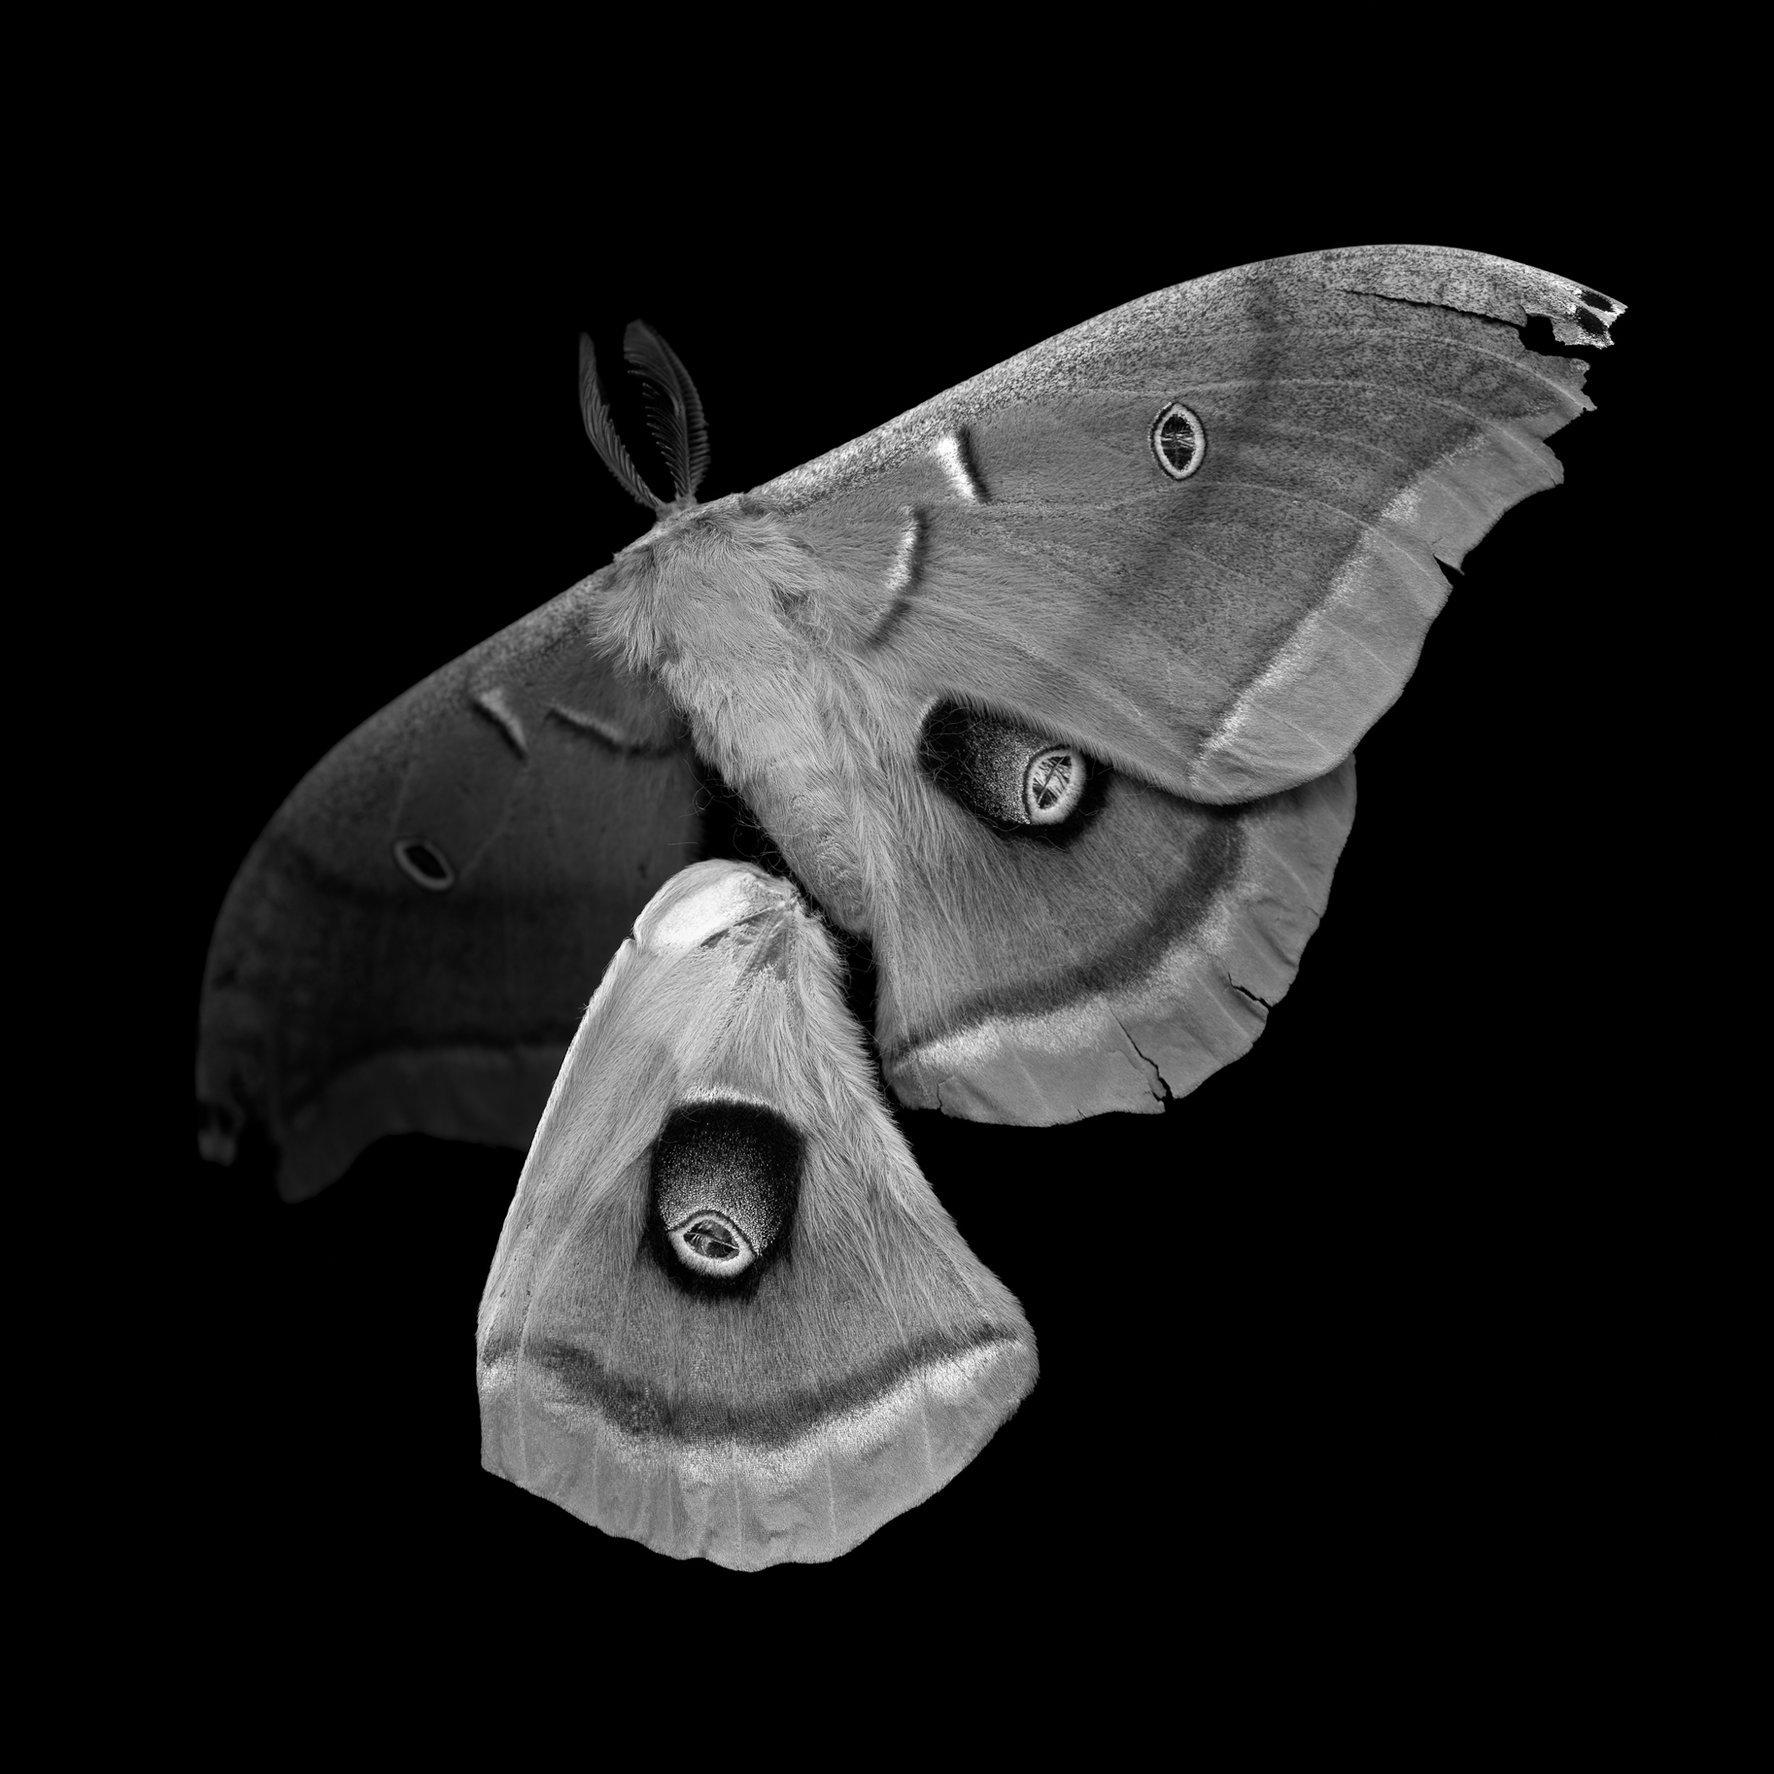 Antheraea polyphemus, 21st century